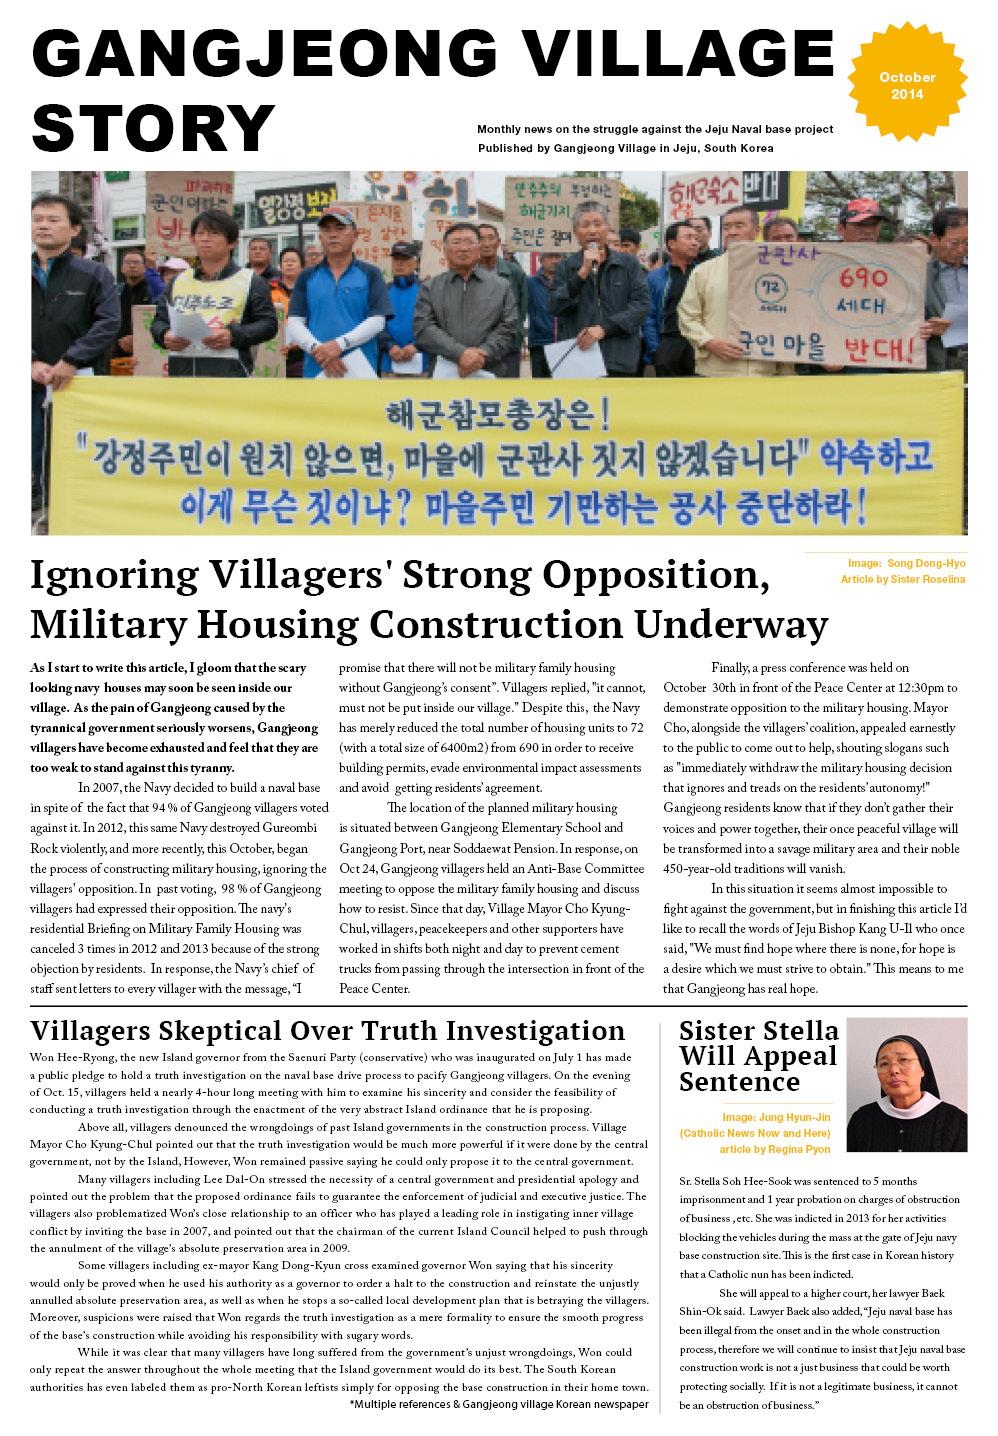 GangjeongEngNewsletter_Oct_2014_Page1